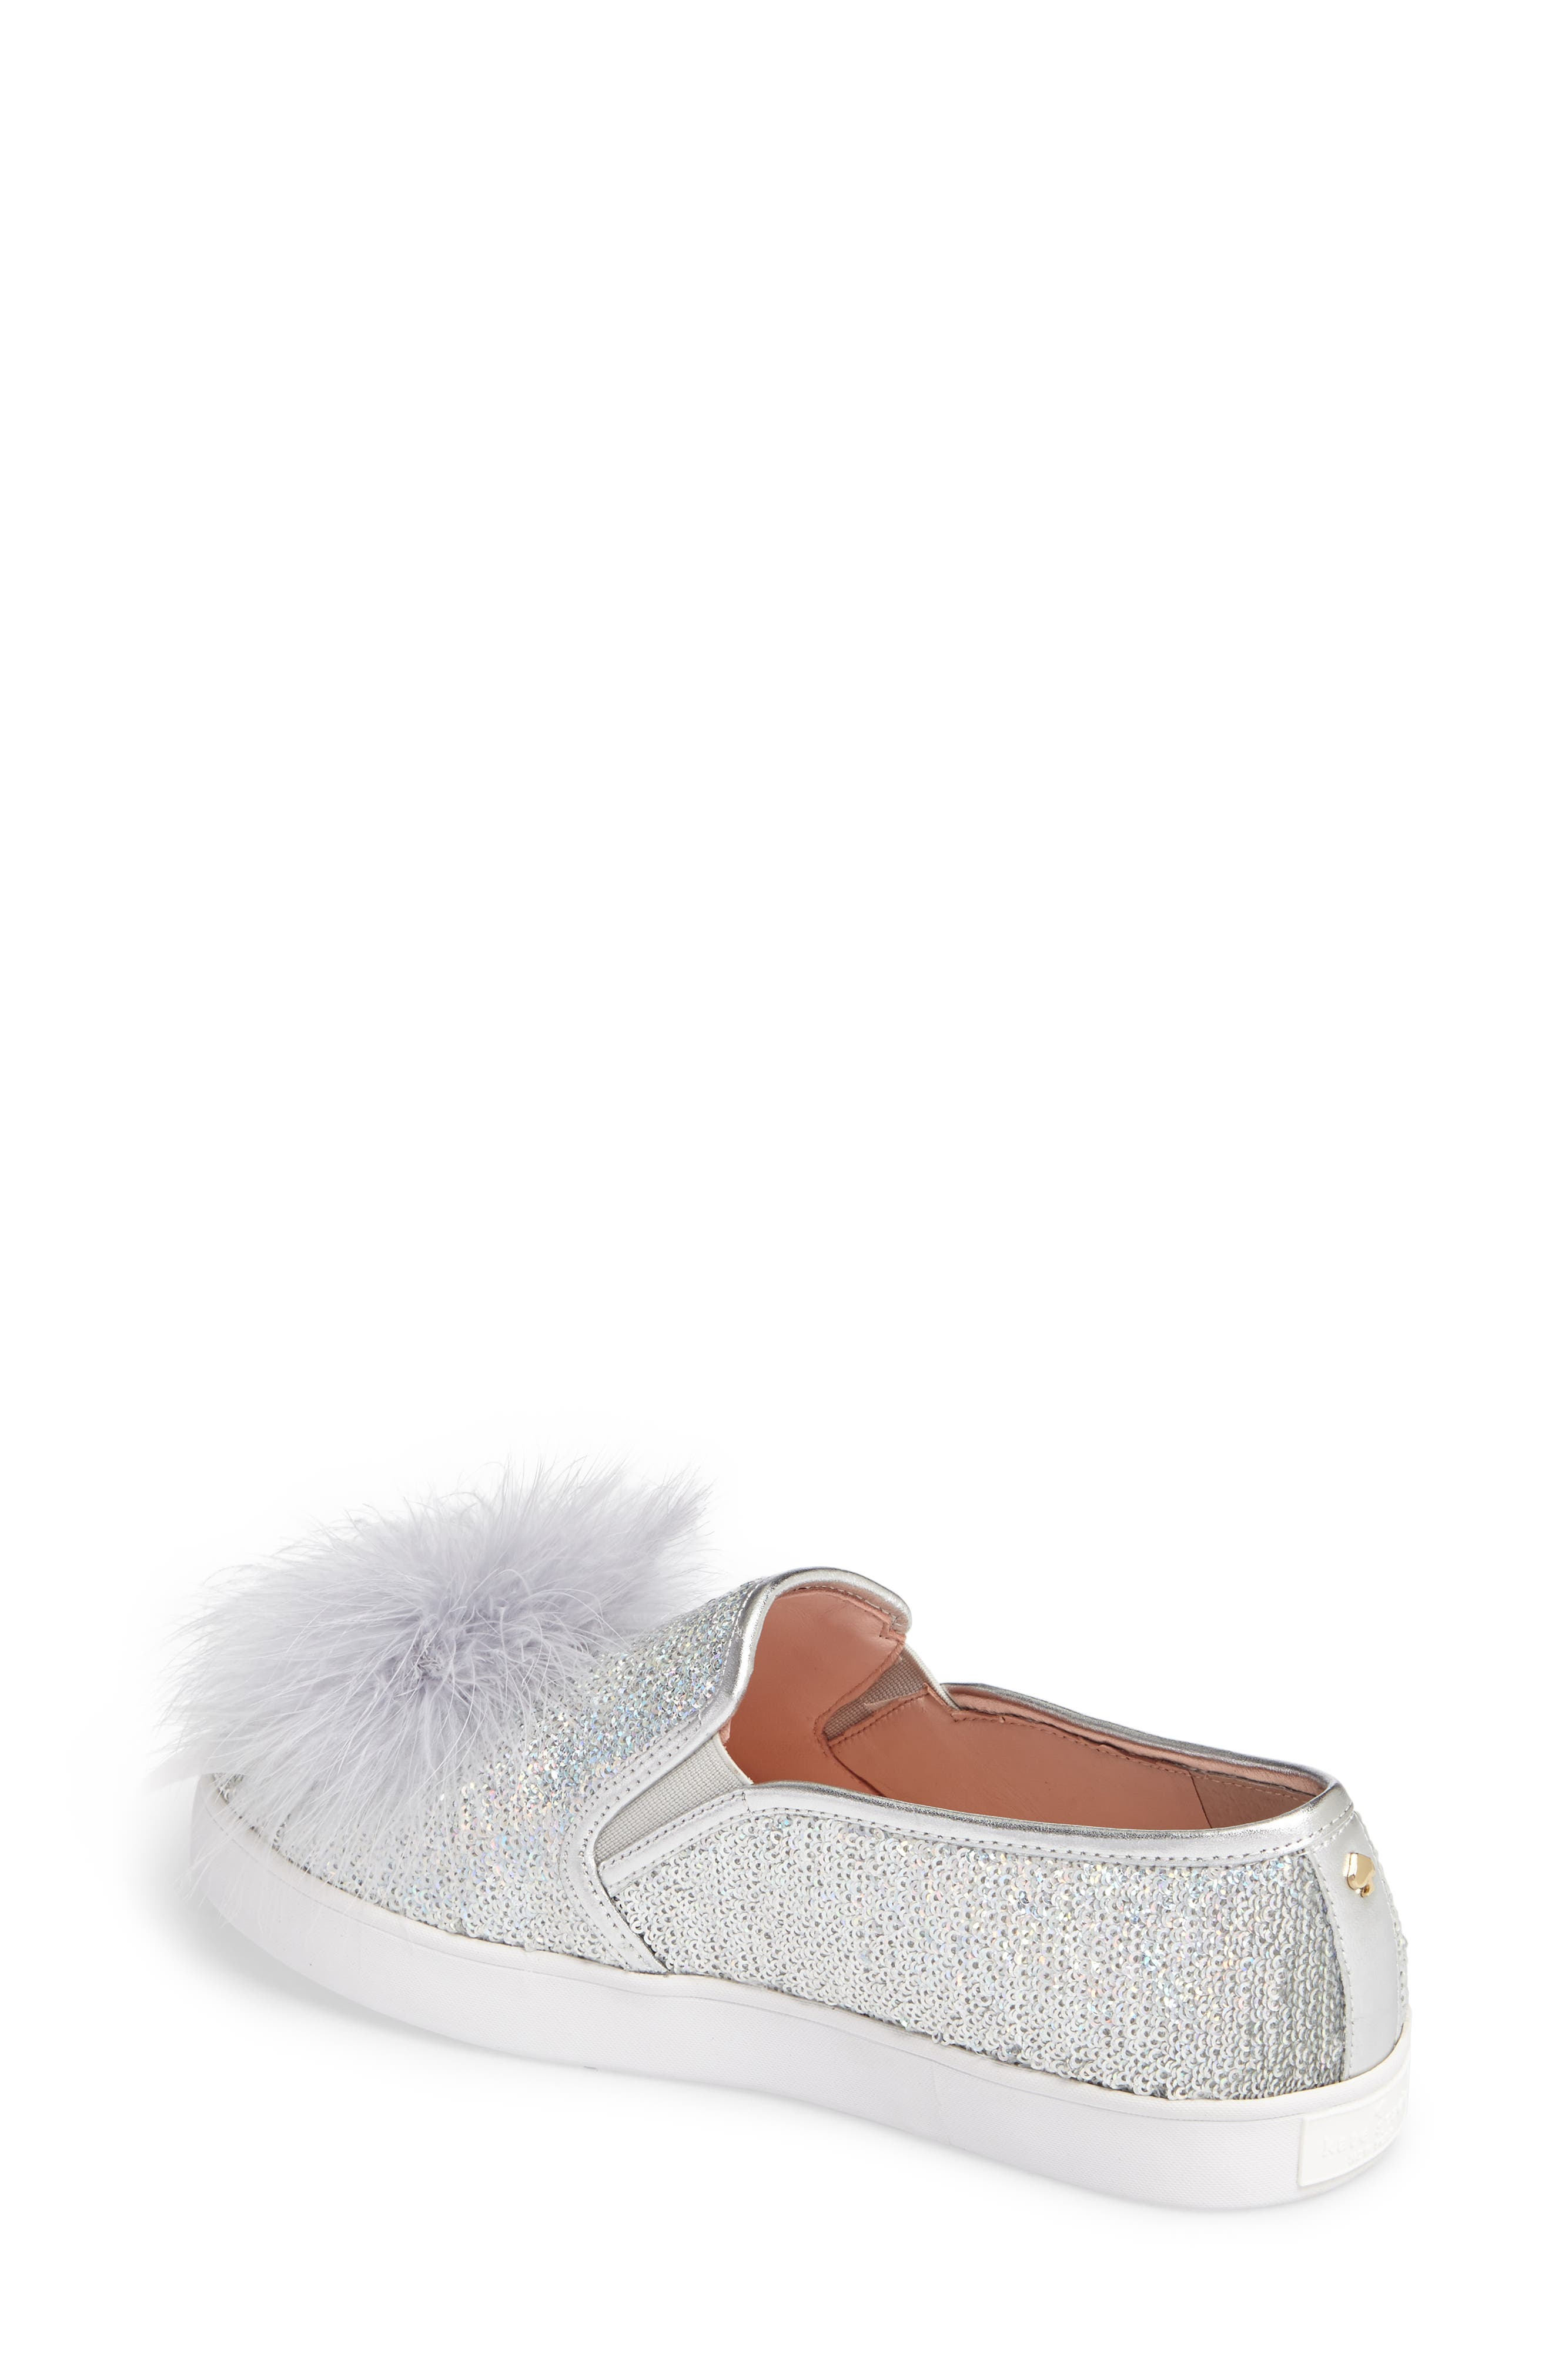 sequin slip-on sneaker,                             Alternate thumbnail 2, color,                             Silver Sequins